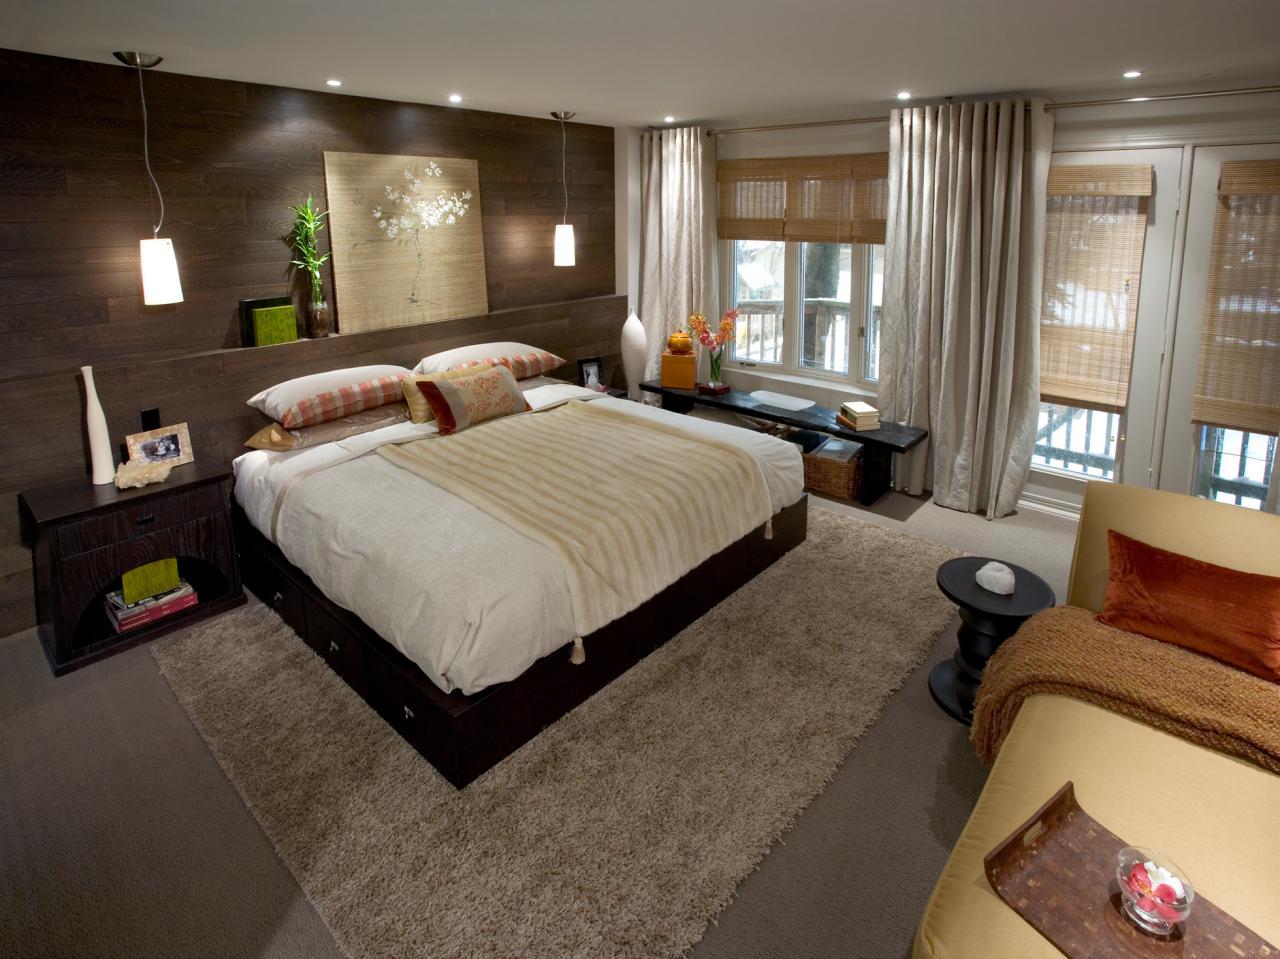 candice olson caribbean bedroom photo - 5